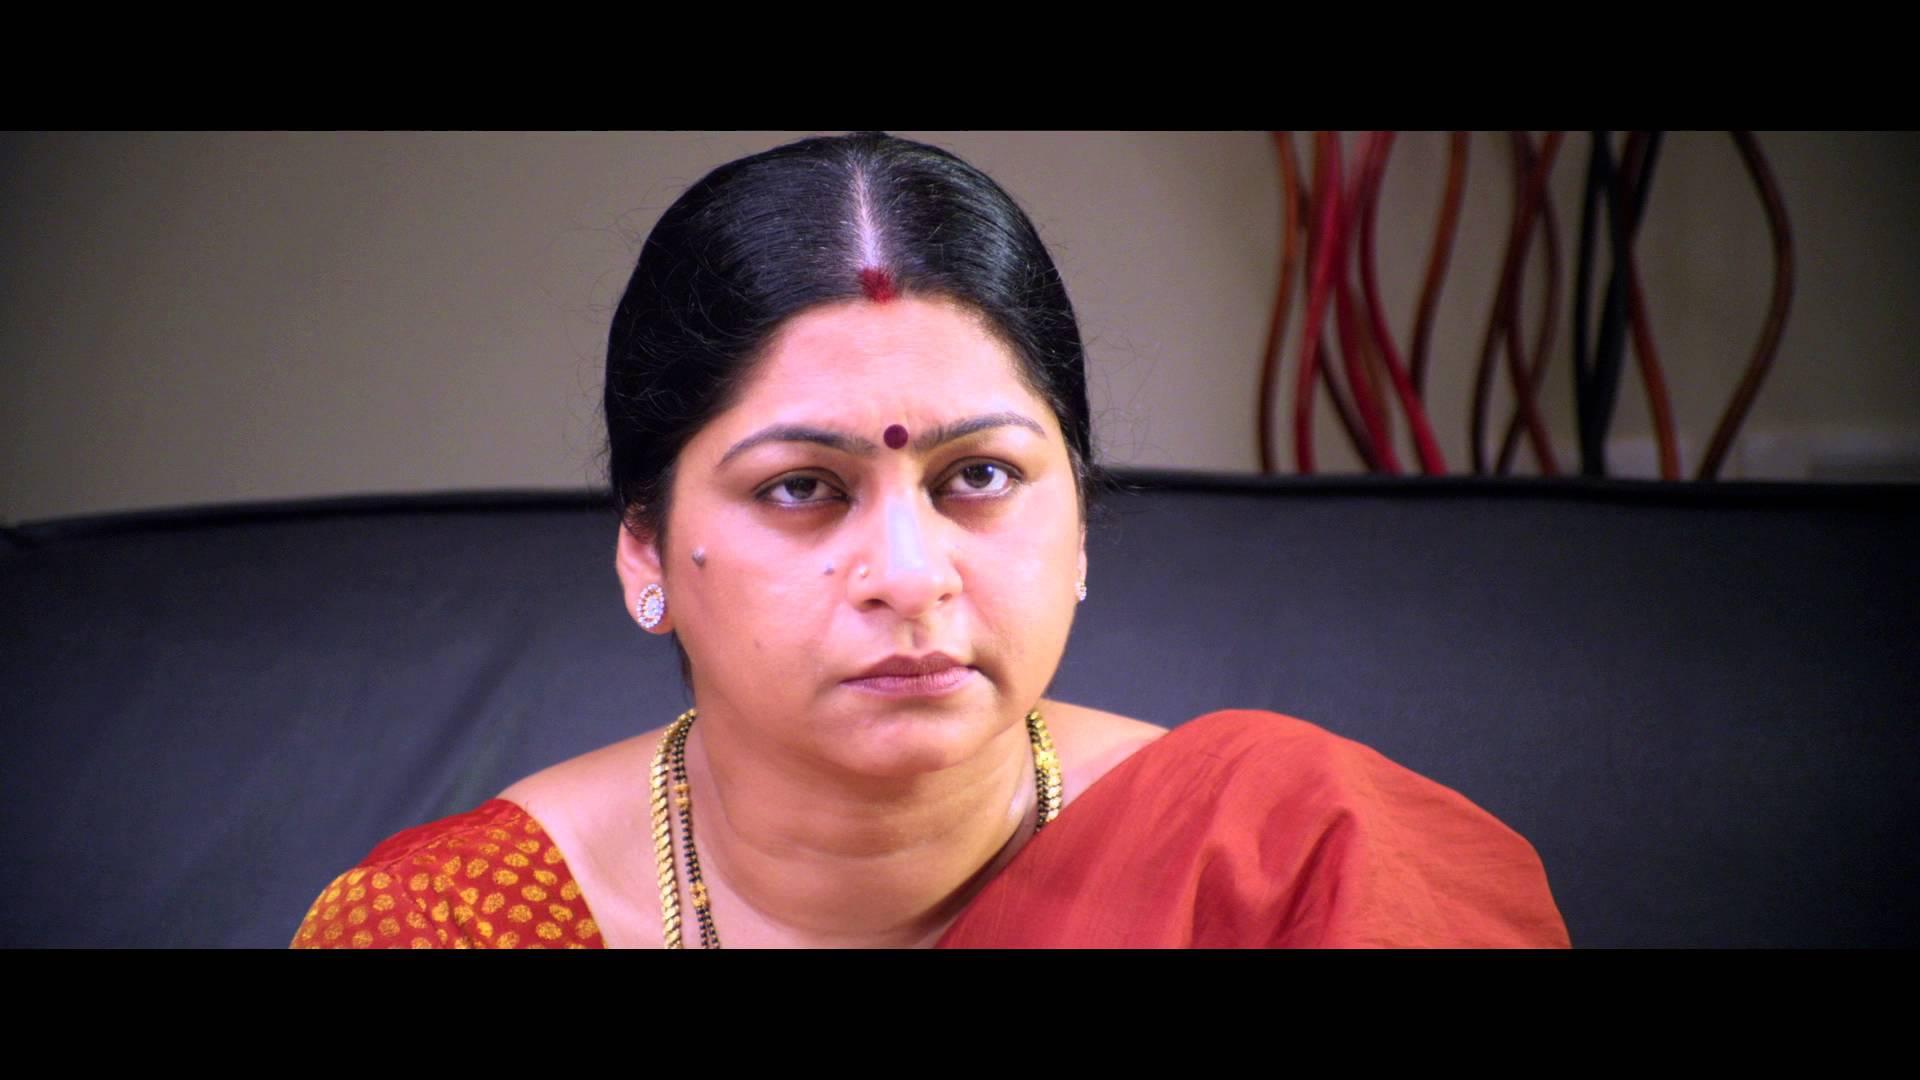 Oru Mugathirai Tamil Film Official Trailer | Madhan Karky | Prem Kumar Sivaperuman